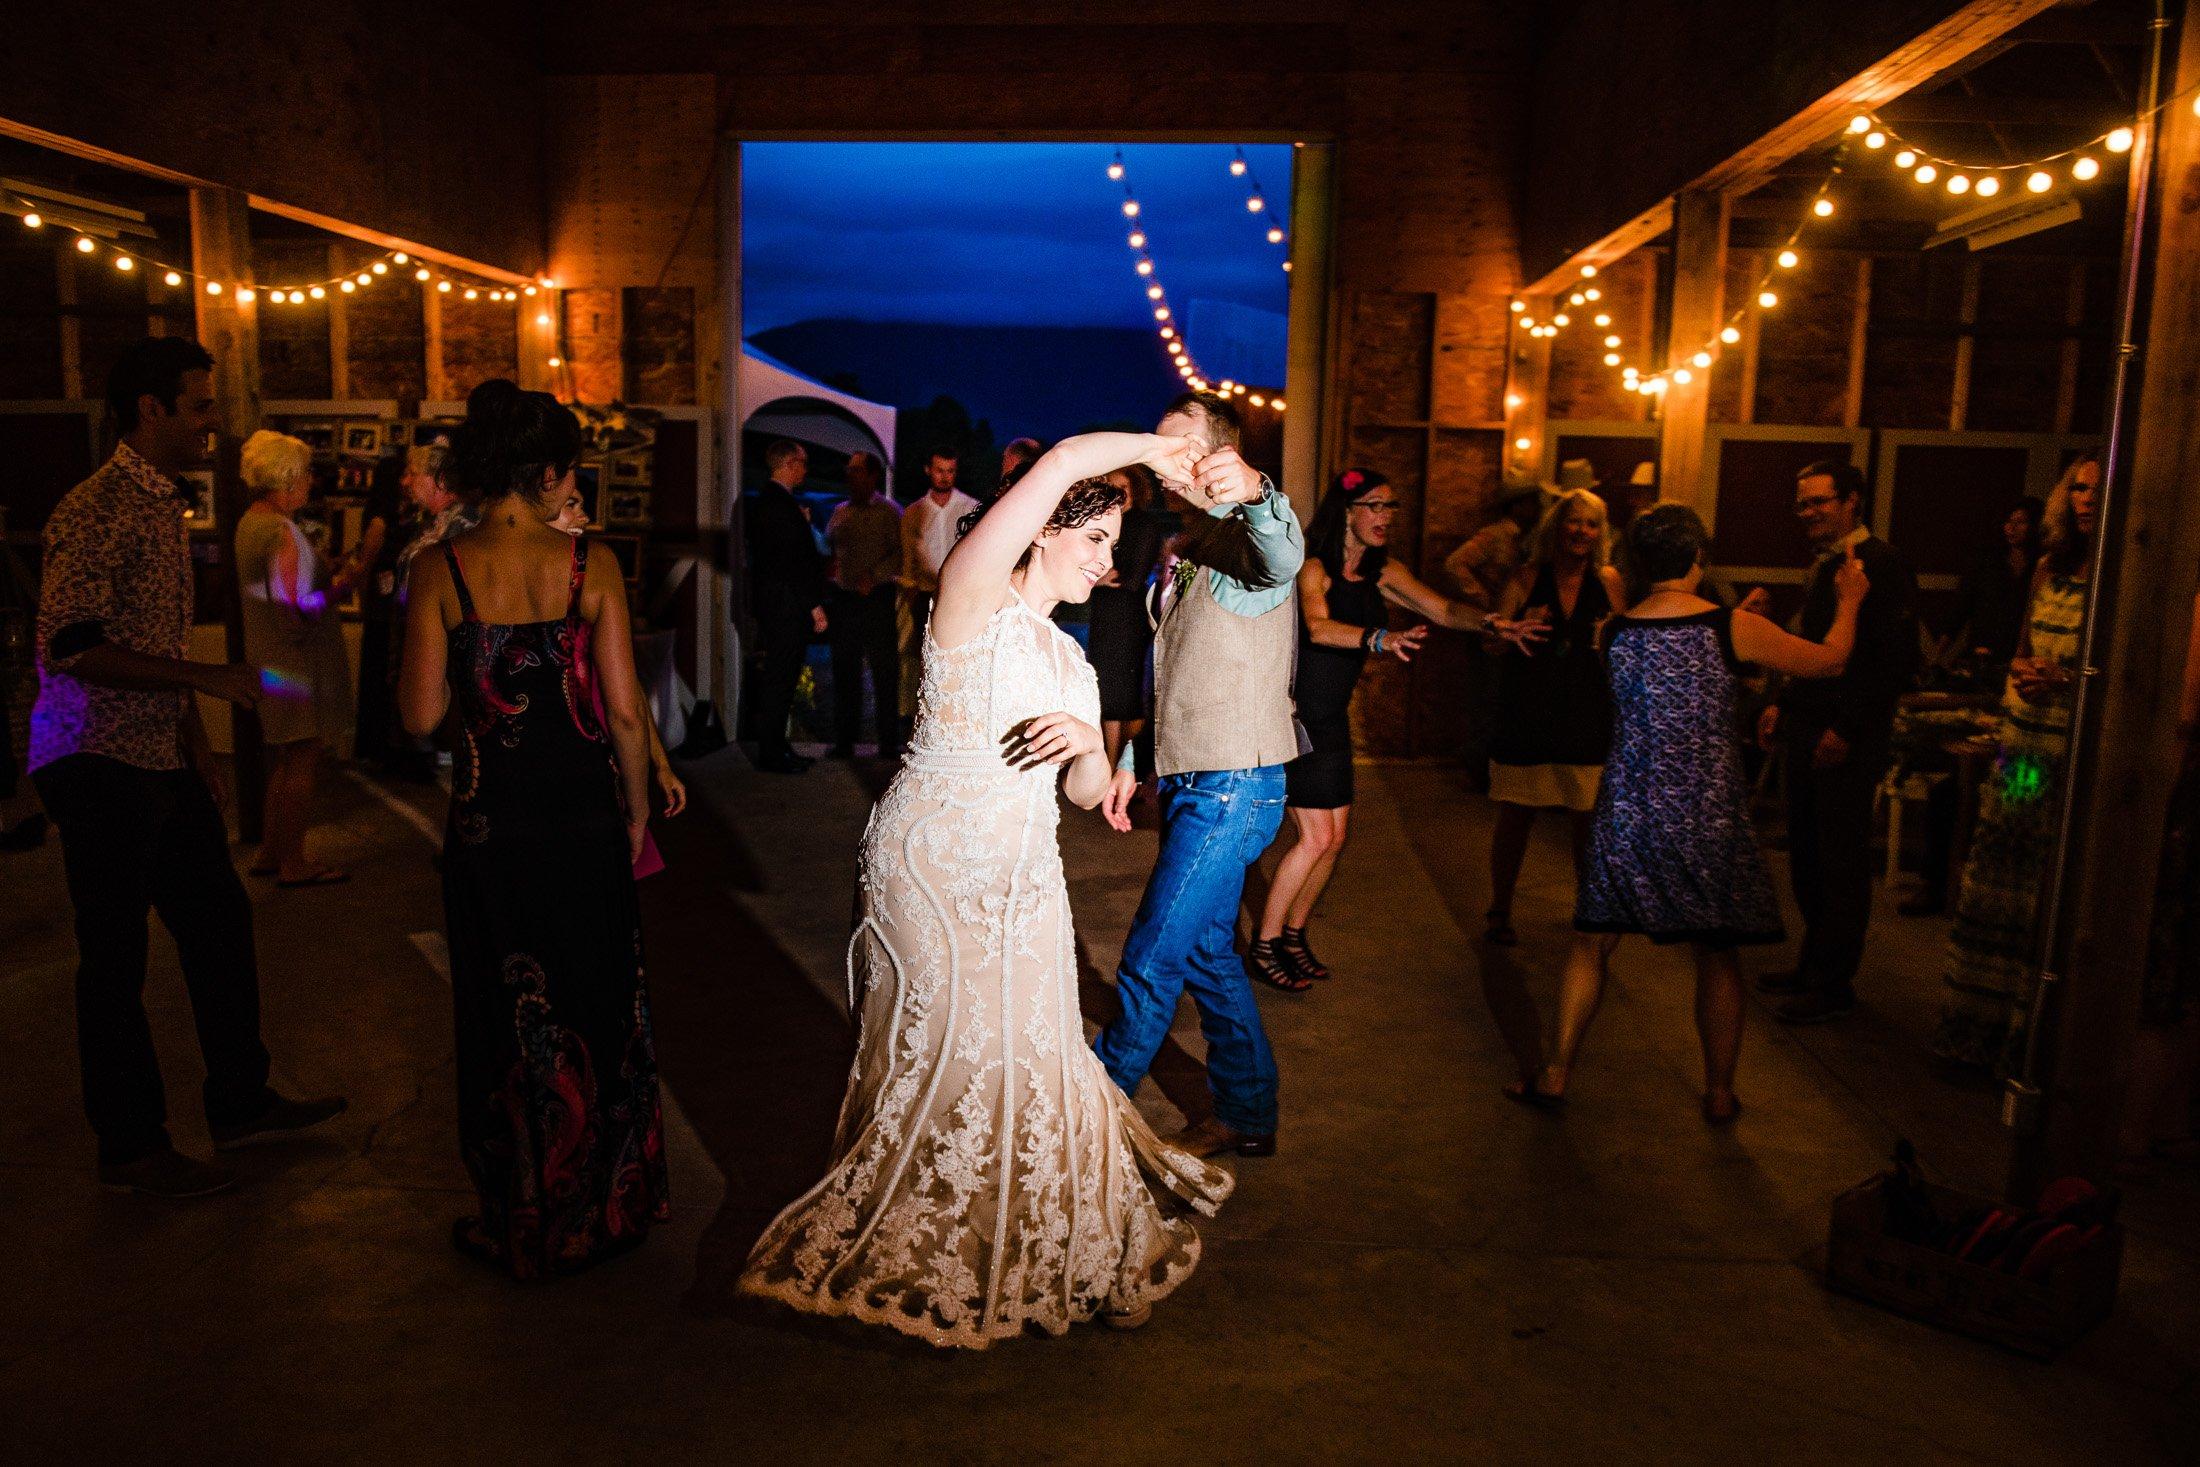 027 - rustic wedding photography vancouver